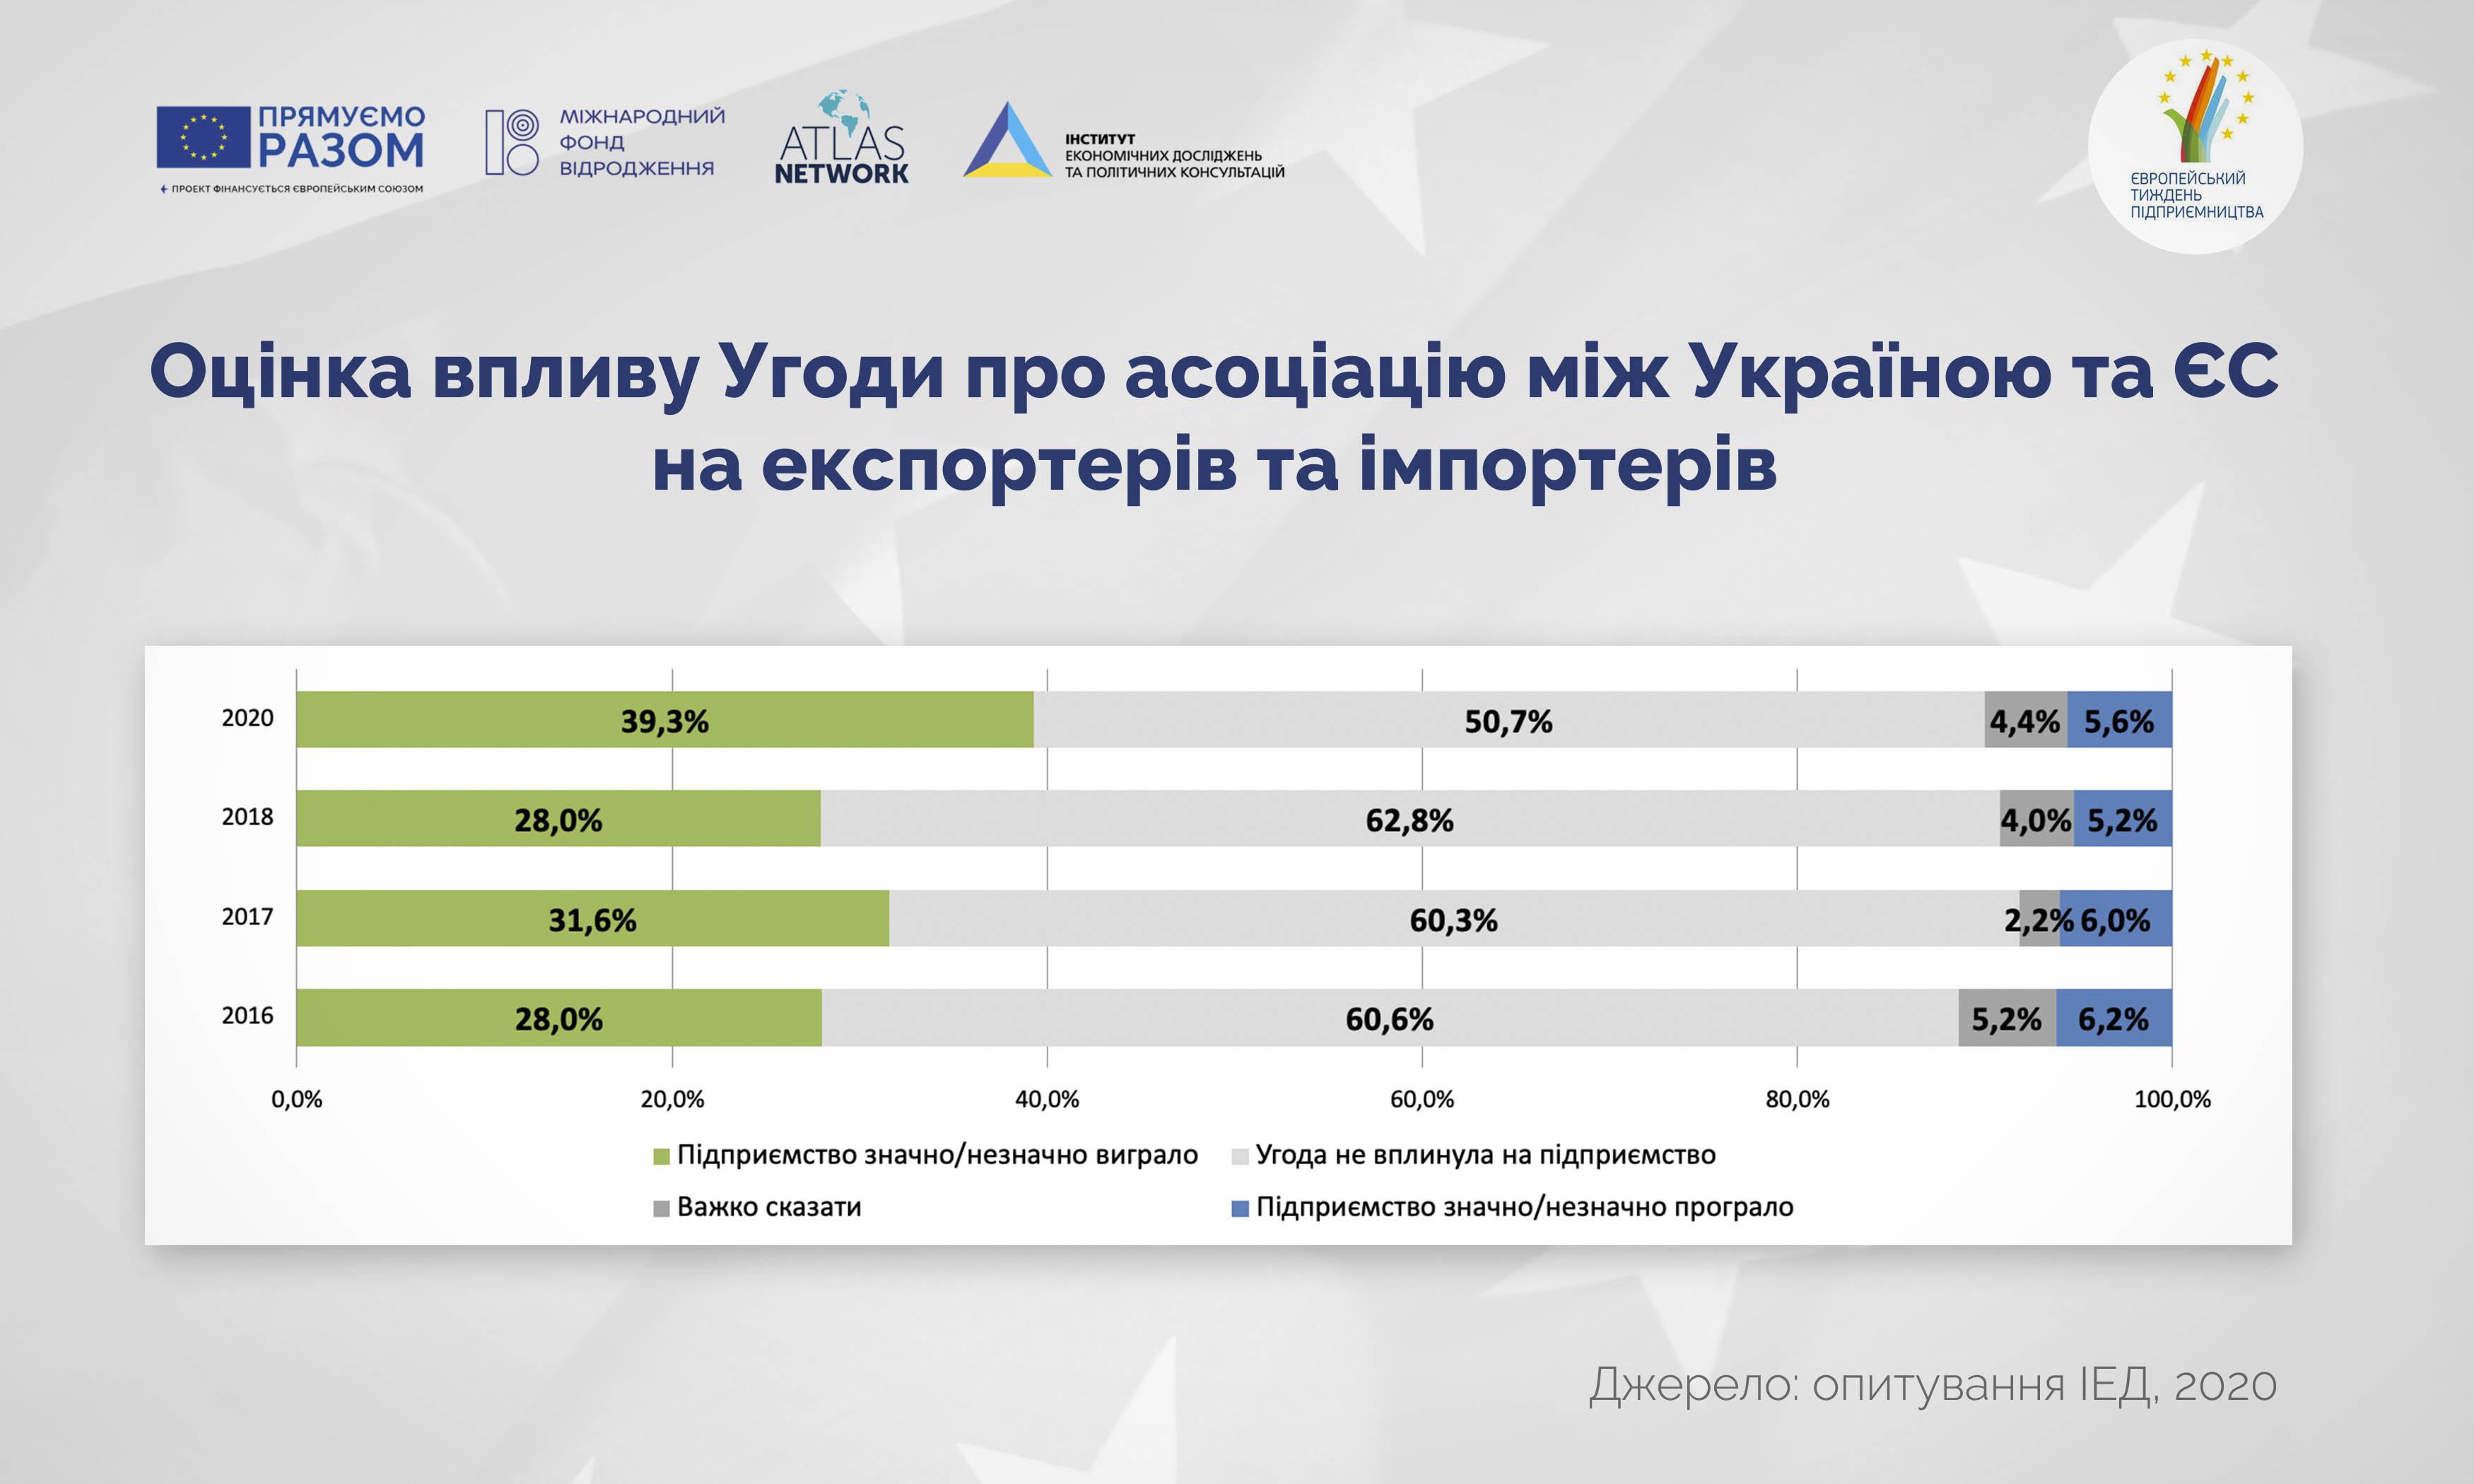 http://www.ier.com.ua/files/Projects/2020/customs_initiative/V_Survey/pic3_1.jpg